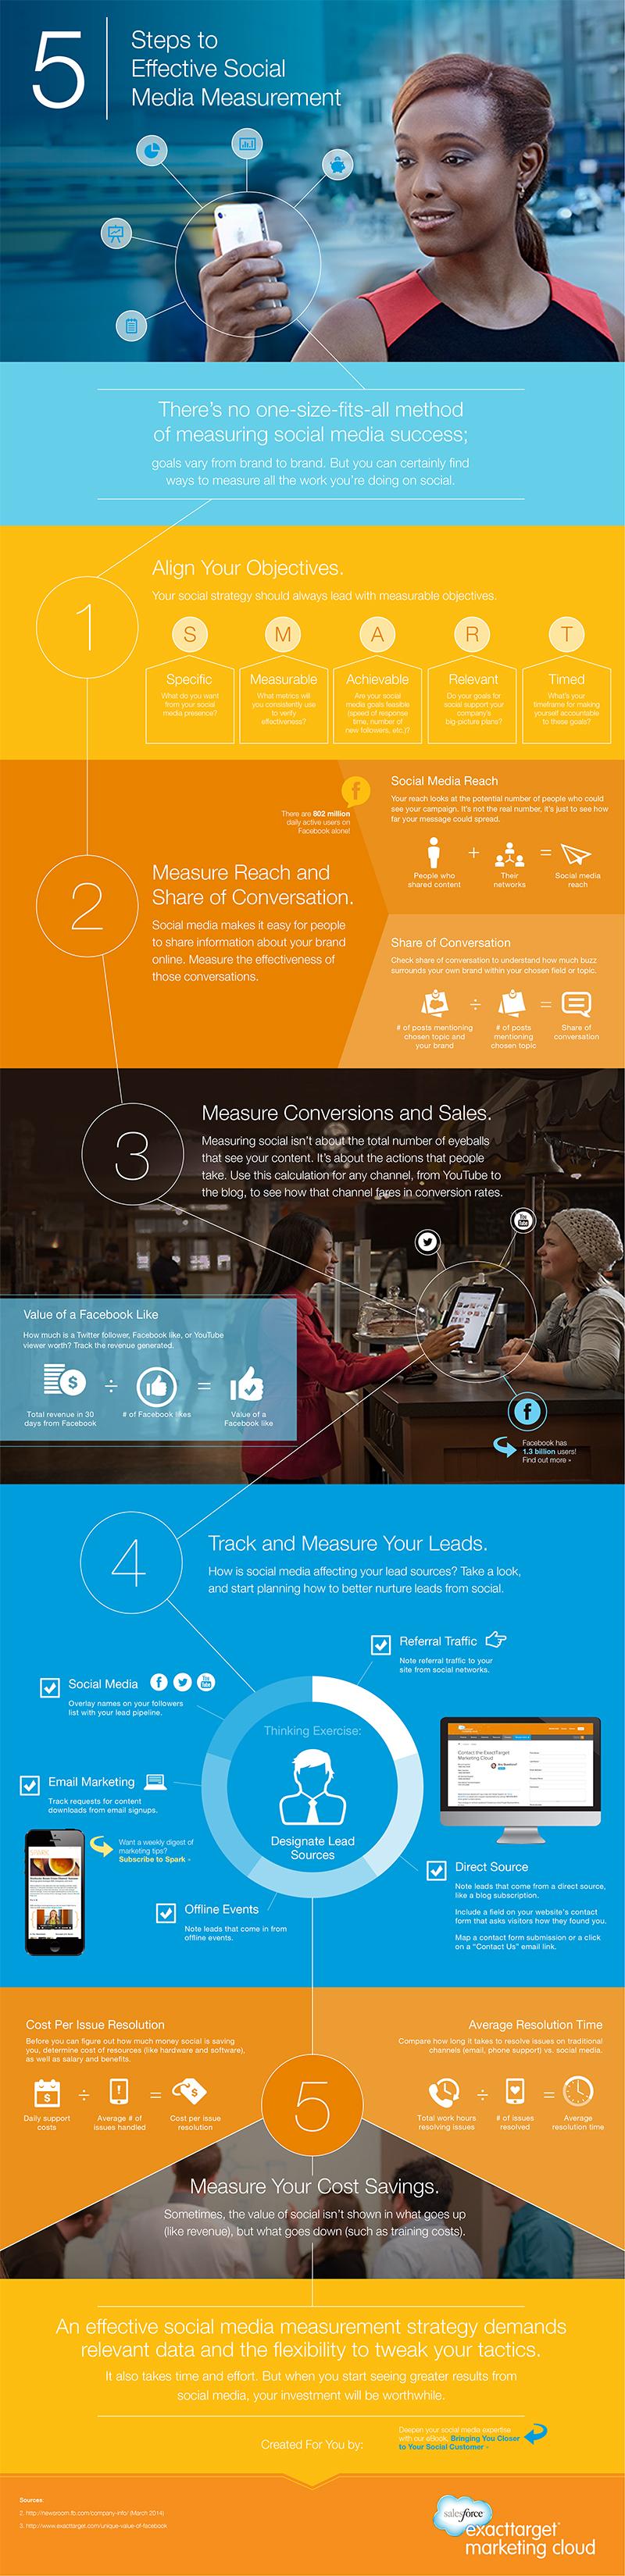 Infographic: Social Media Measurement